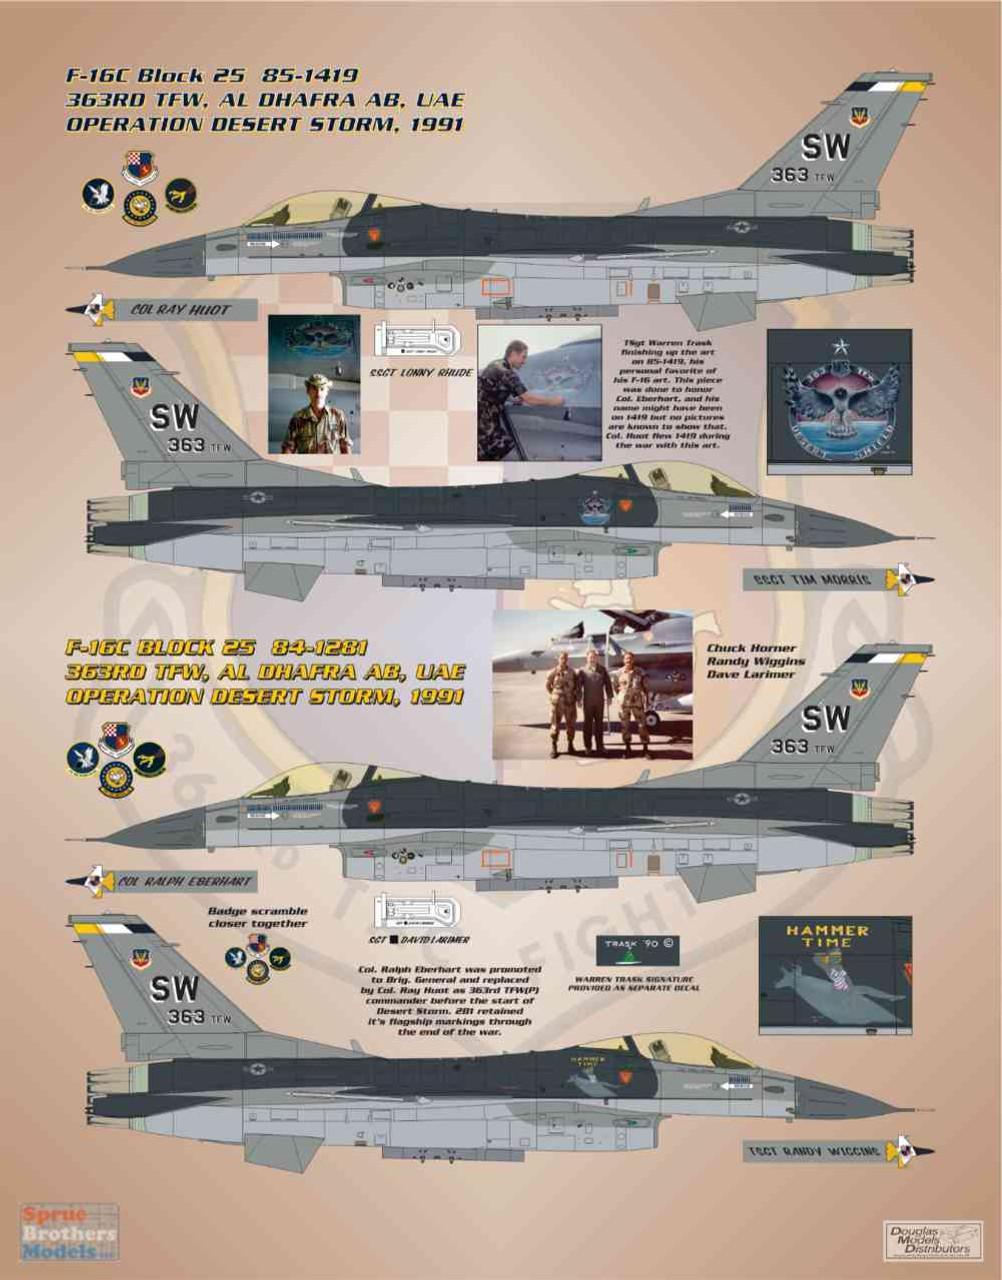 BMA48014 1:48 Bullseye Model Aviation Decals - F-16C F-16A Viper / Falcon 'Desert Storm Vipers II'